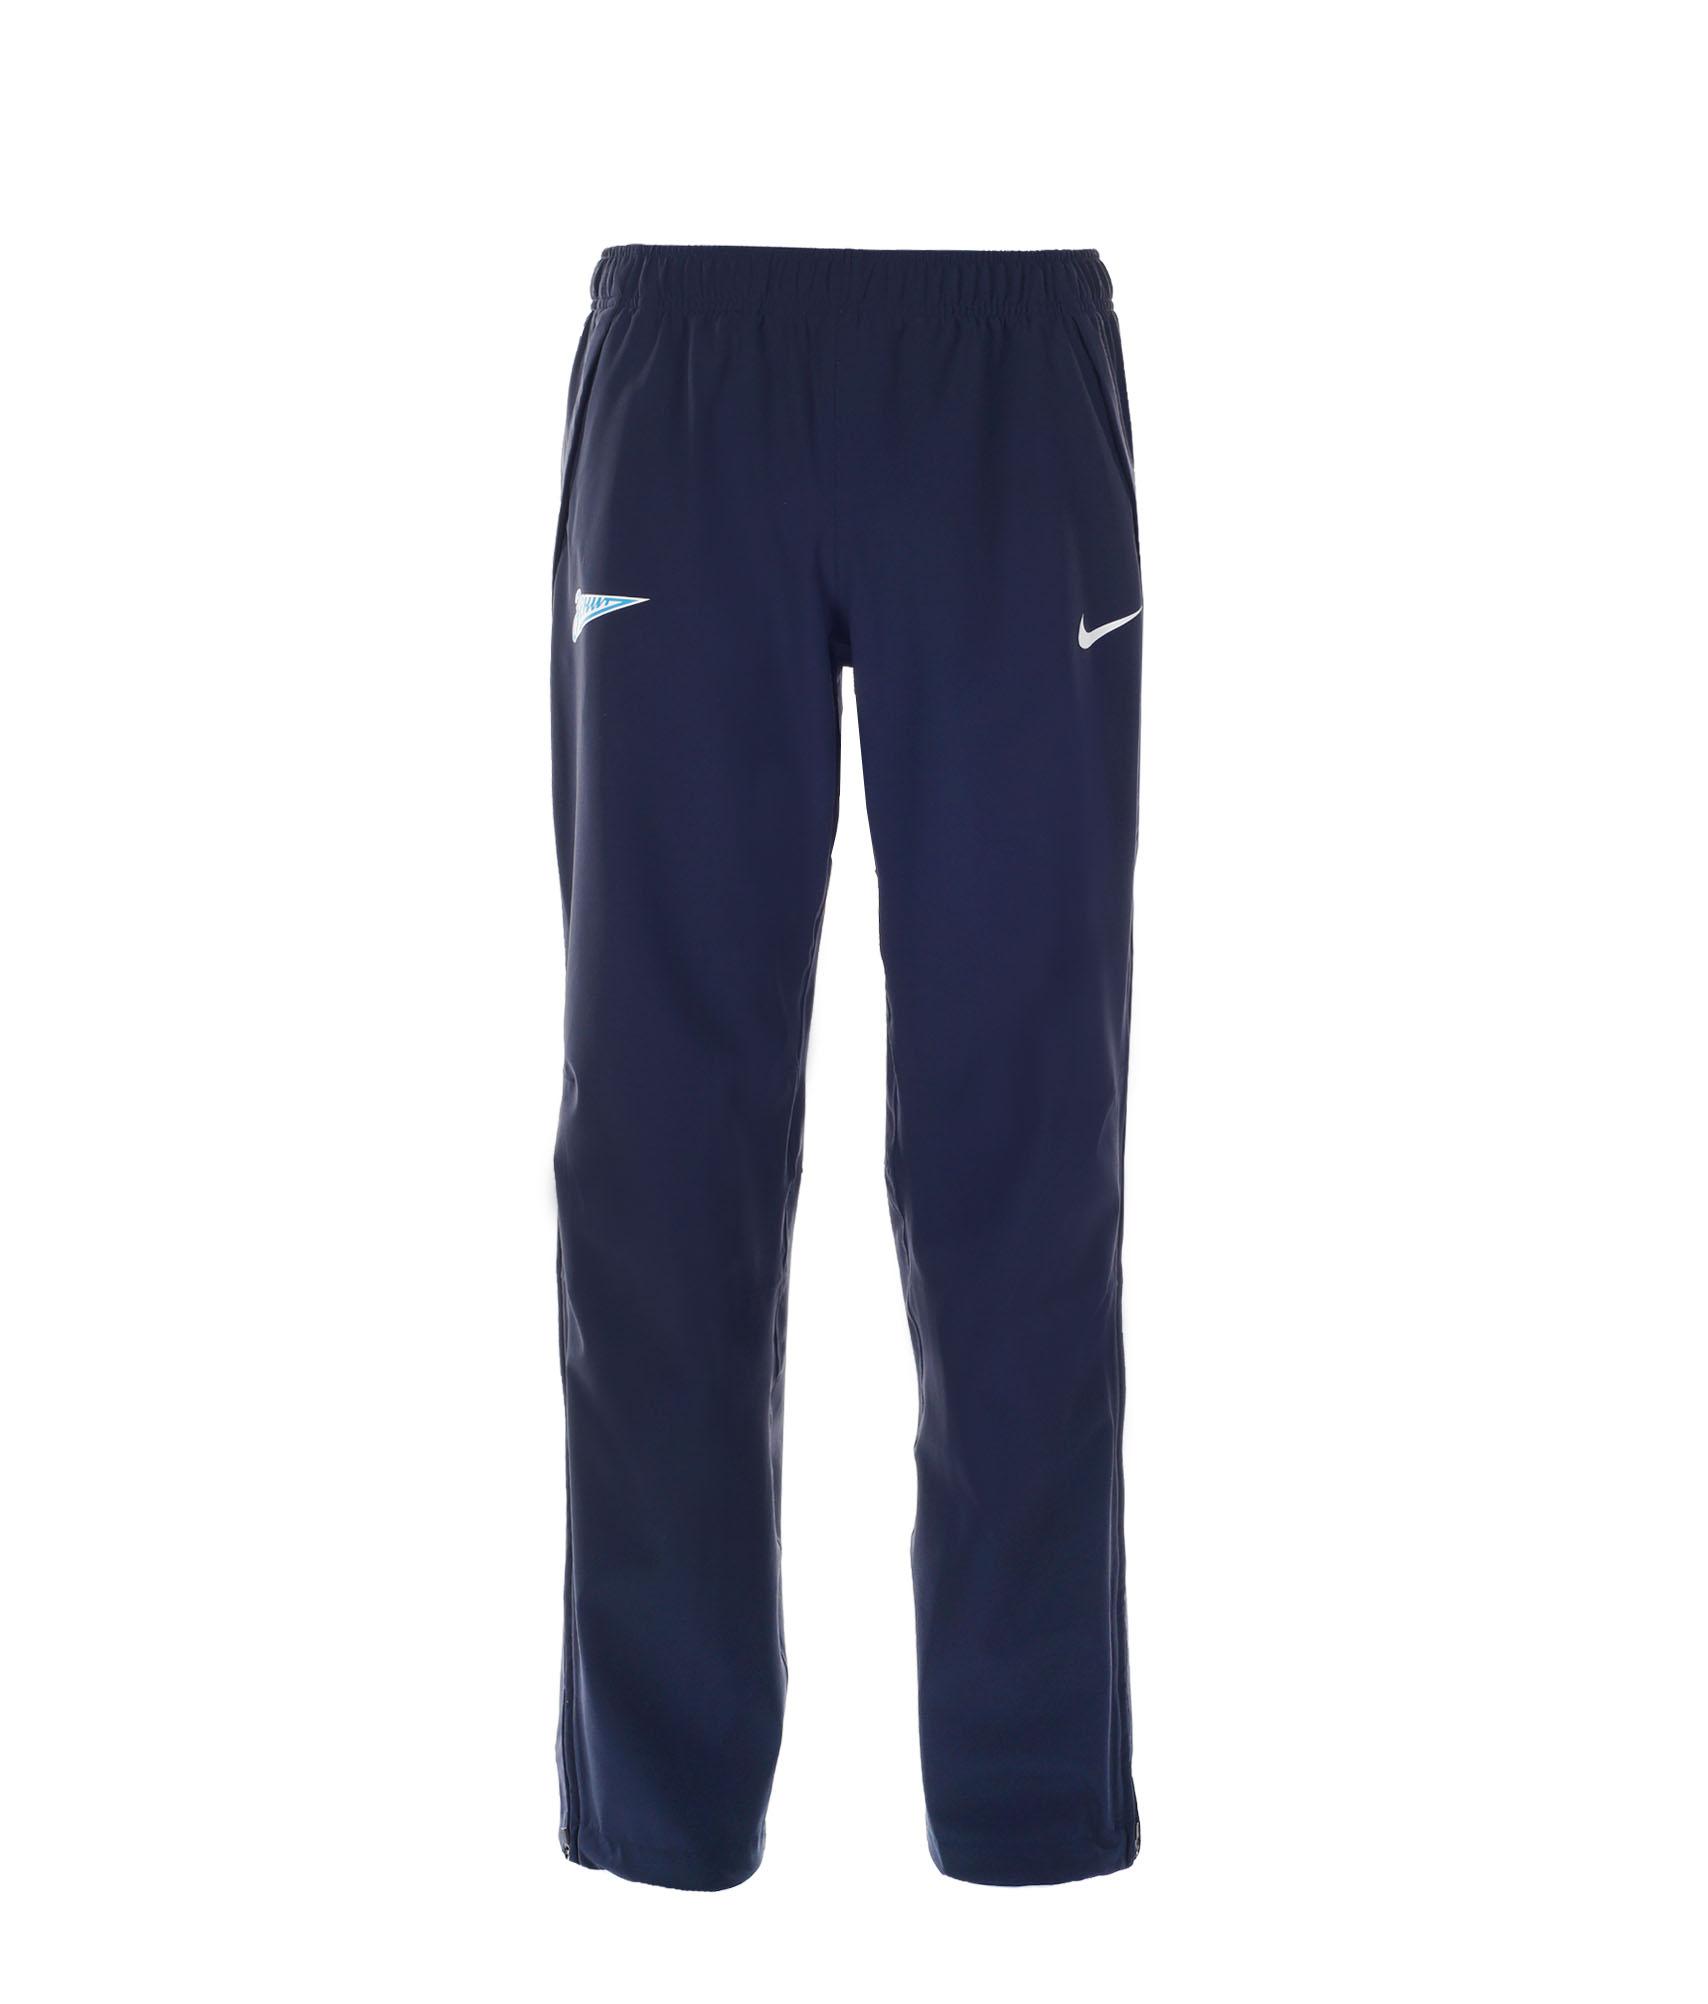 Брюки Nike Zenit Select Pro Rain Pant, Цвет-Синий, Размер-S